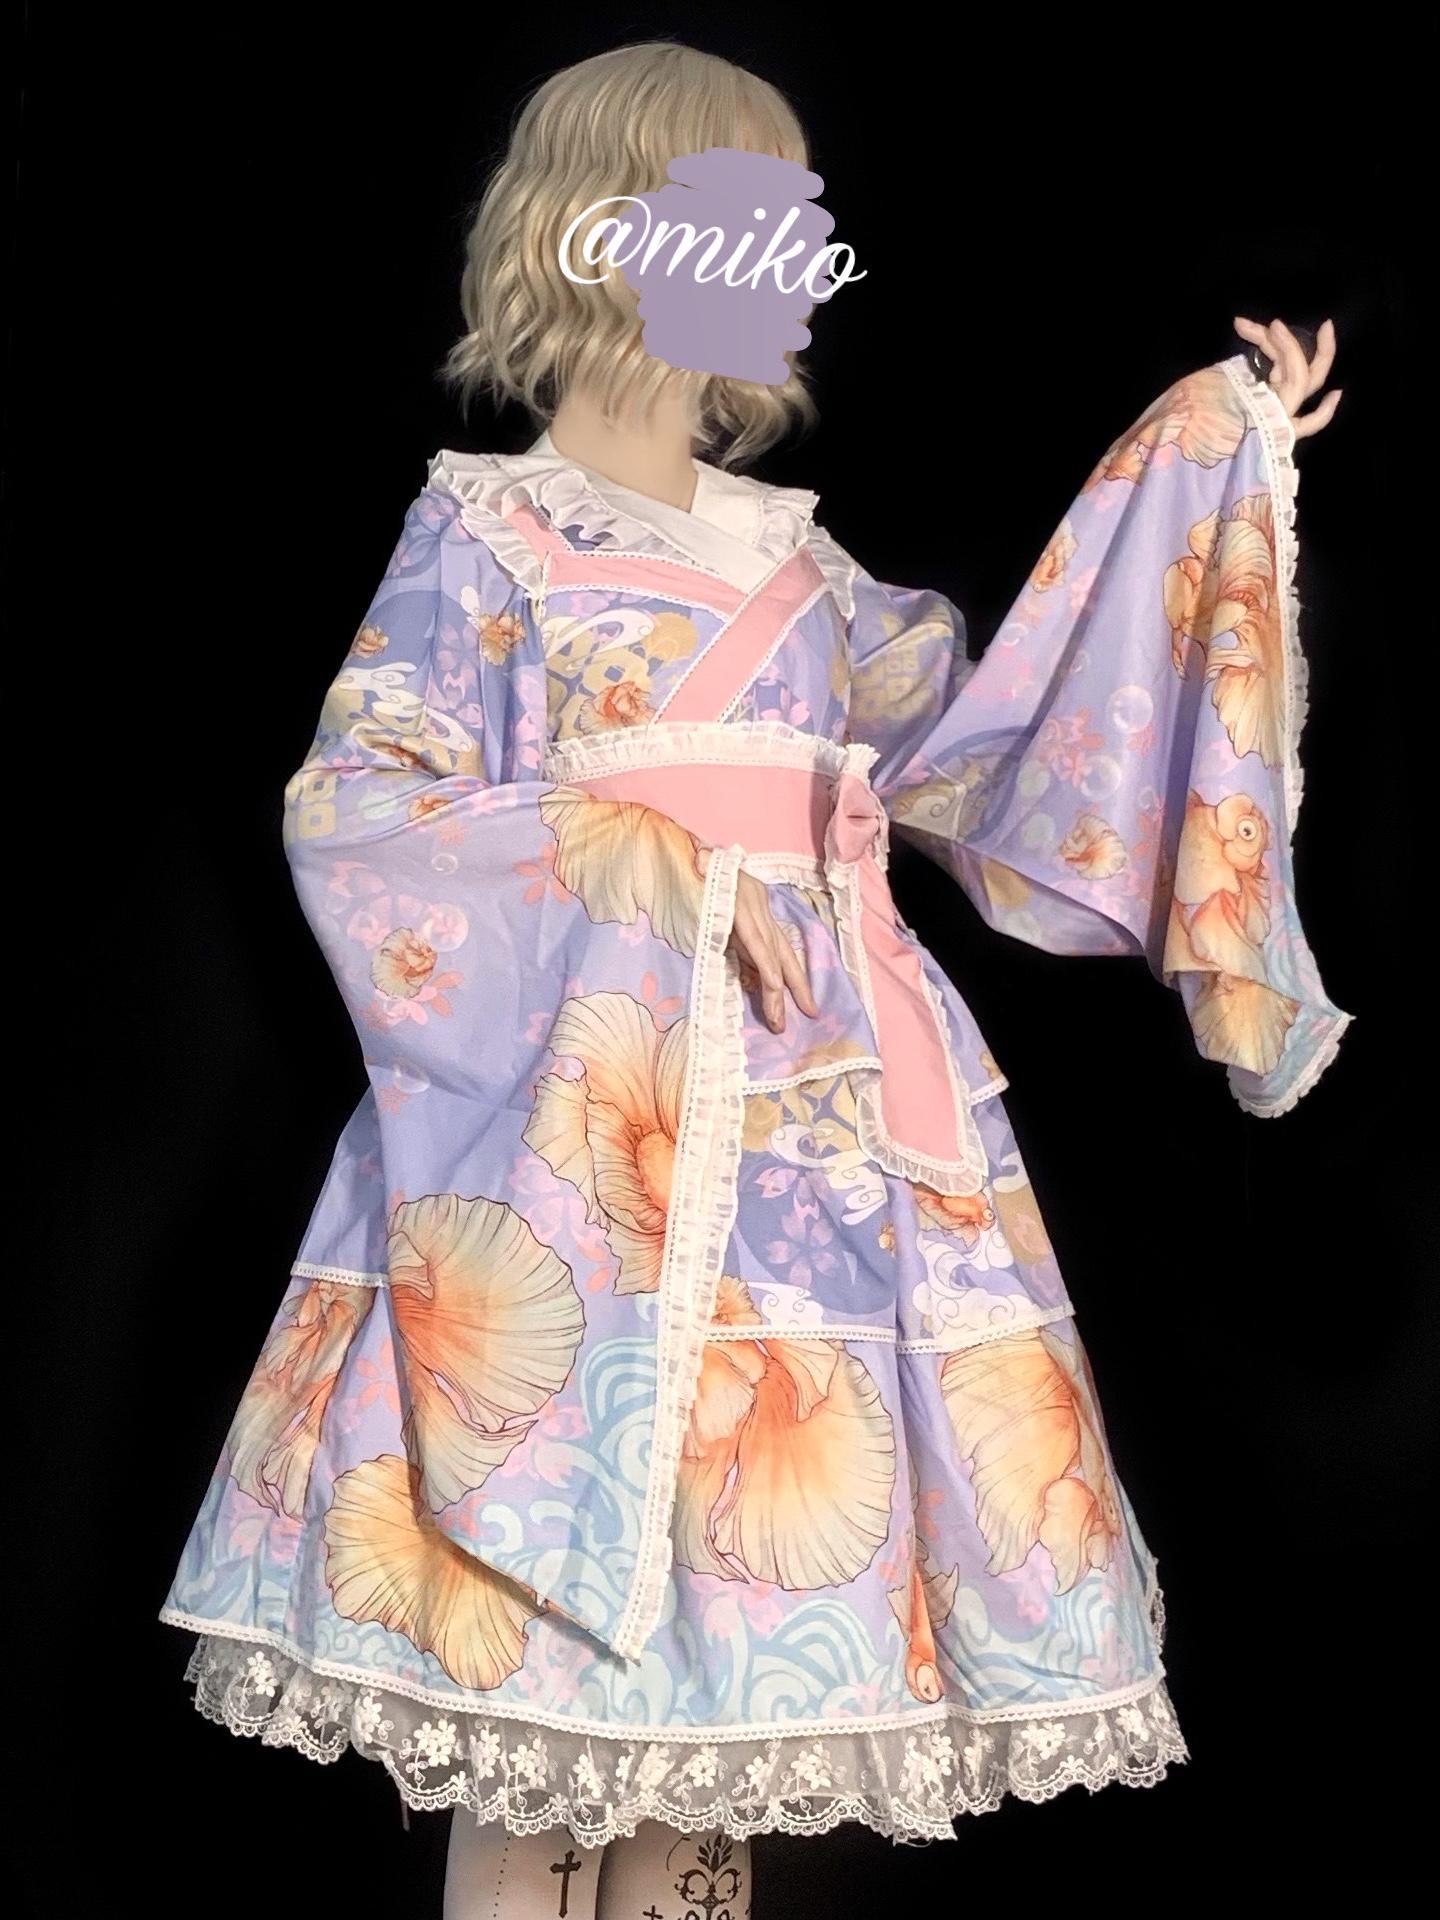 [deposit] original design Lolita and wind Lolita skirt red scale fish jsk dress